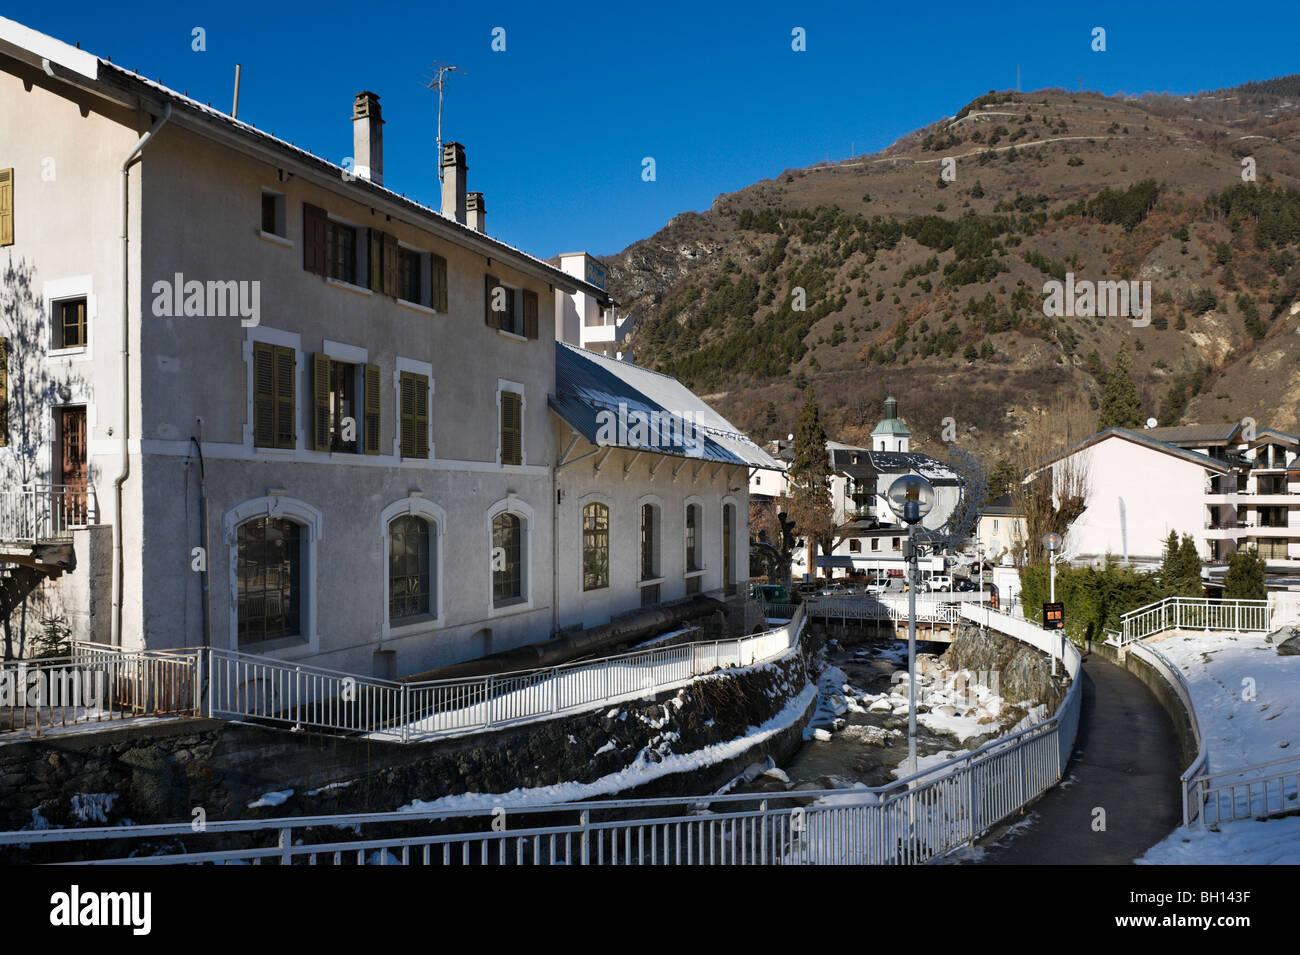 The town centre, Brides les Bains, Tarentaise Valley, Savoie, France - Stock Image